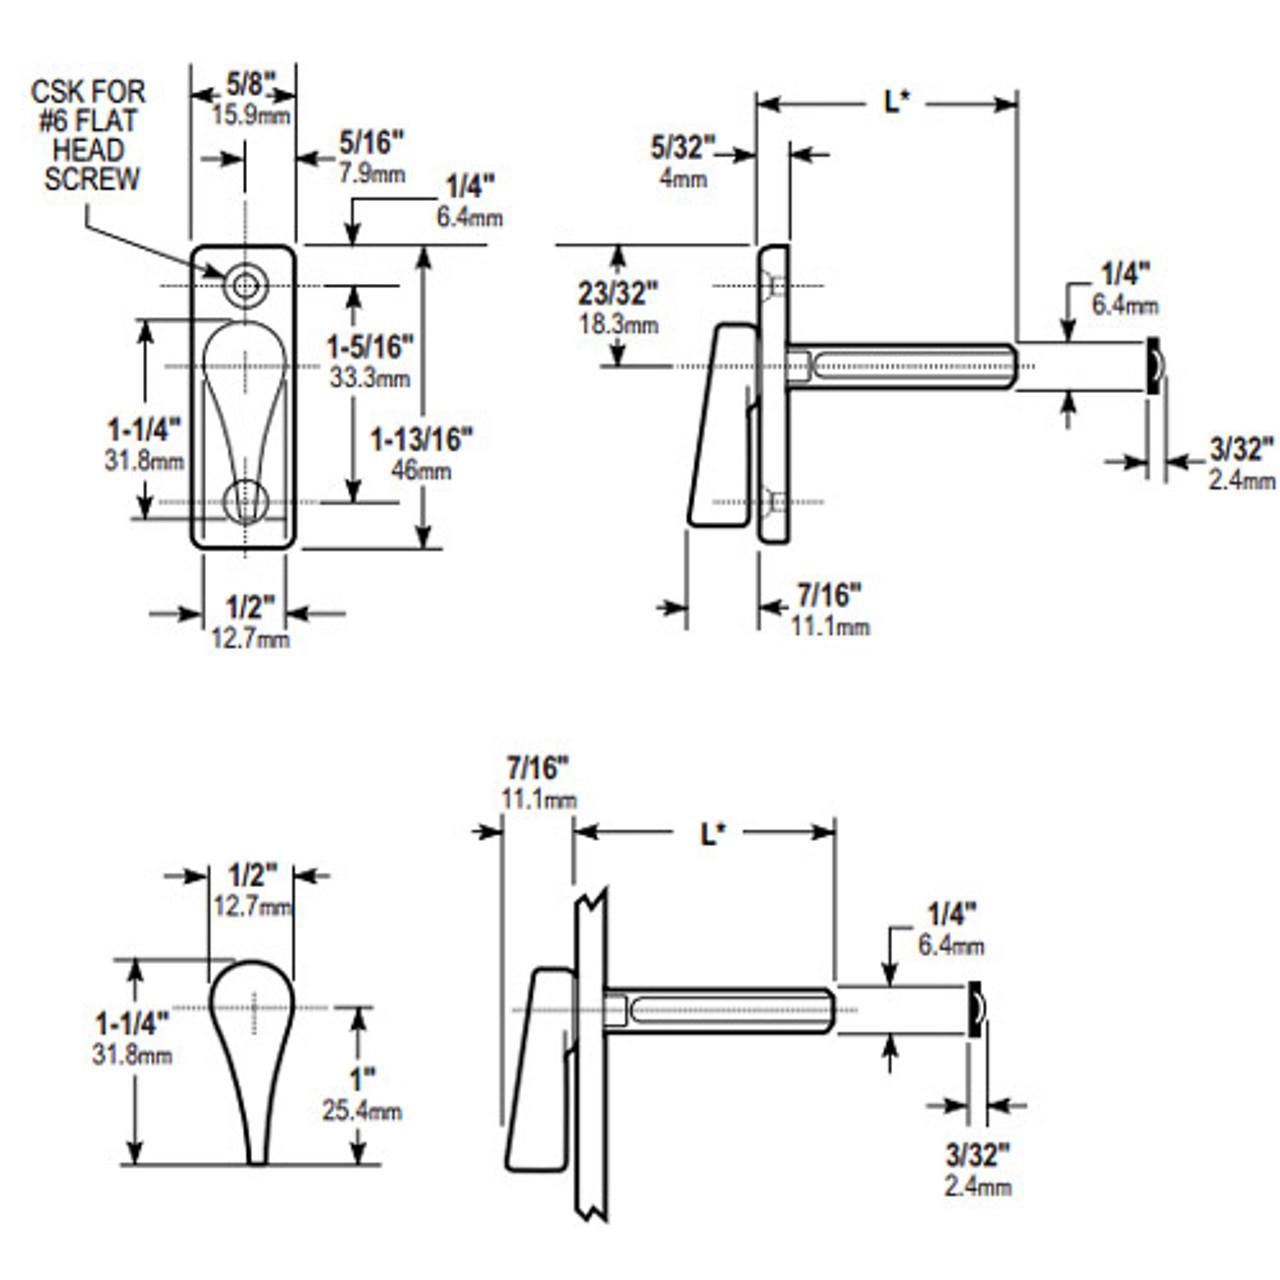 1000-11-24-121 Adams Rite 1000 Series Turns Dimensional View